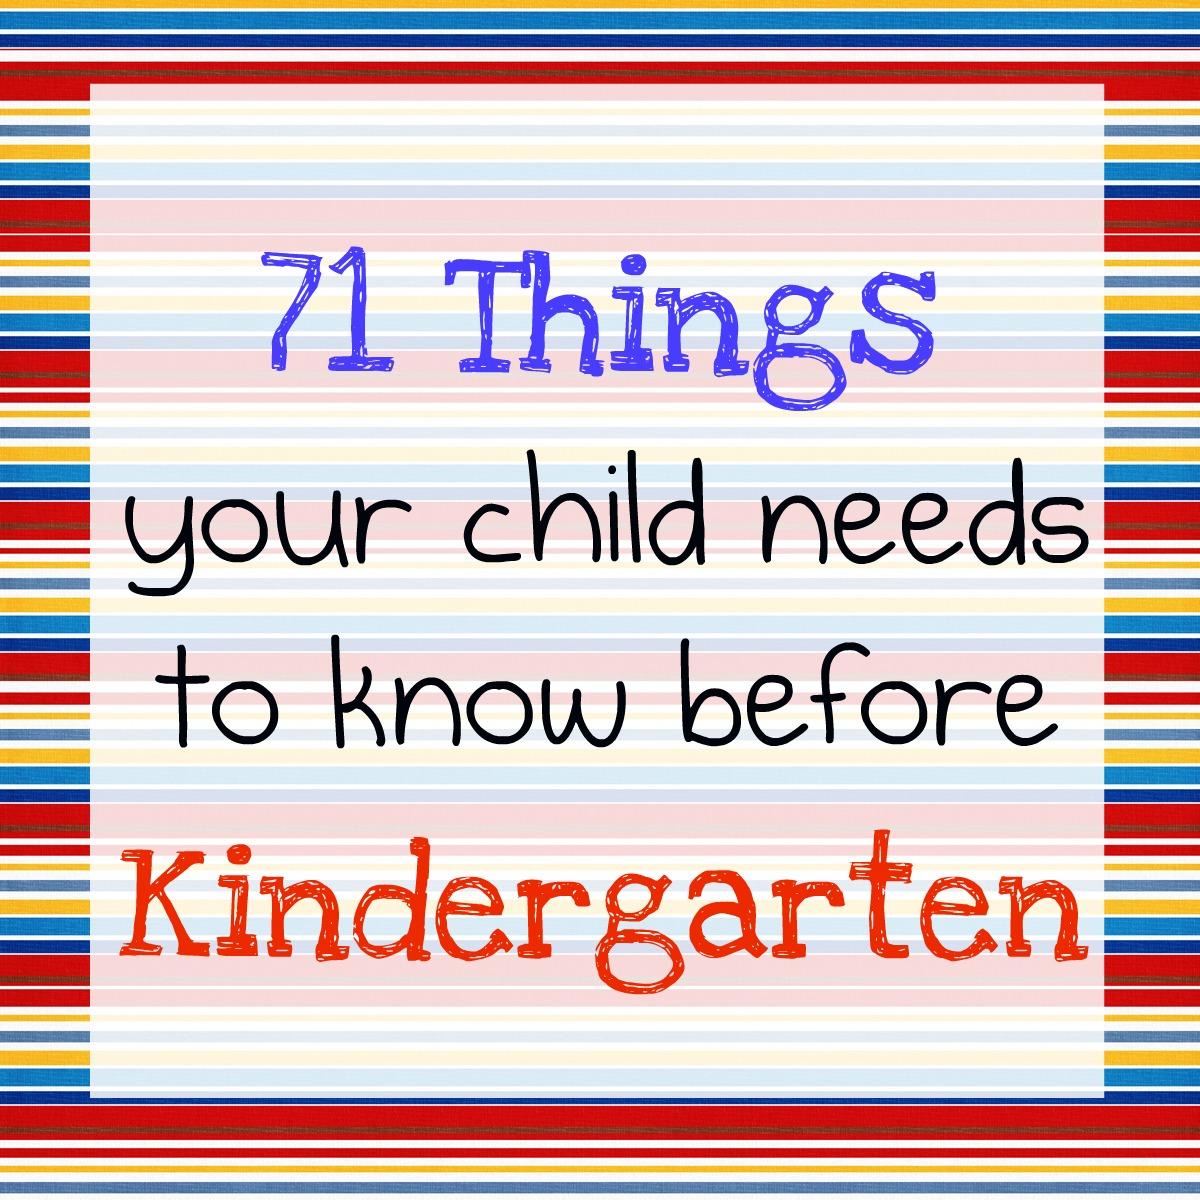 Walsh Elementary School Kindergarteners